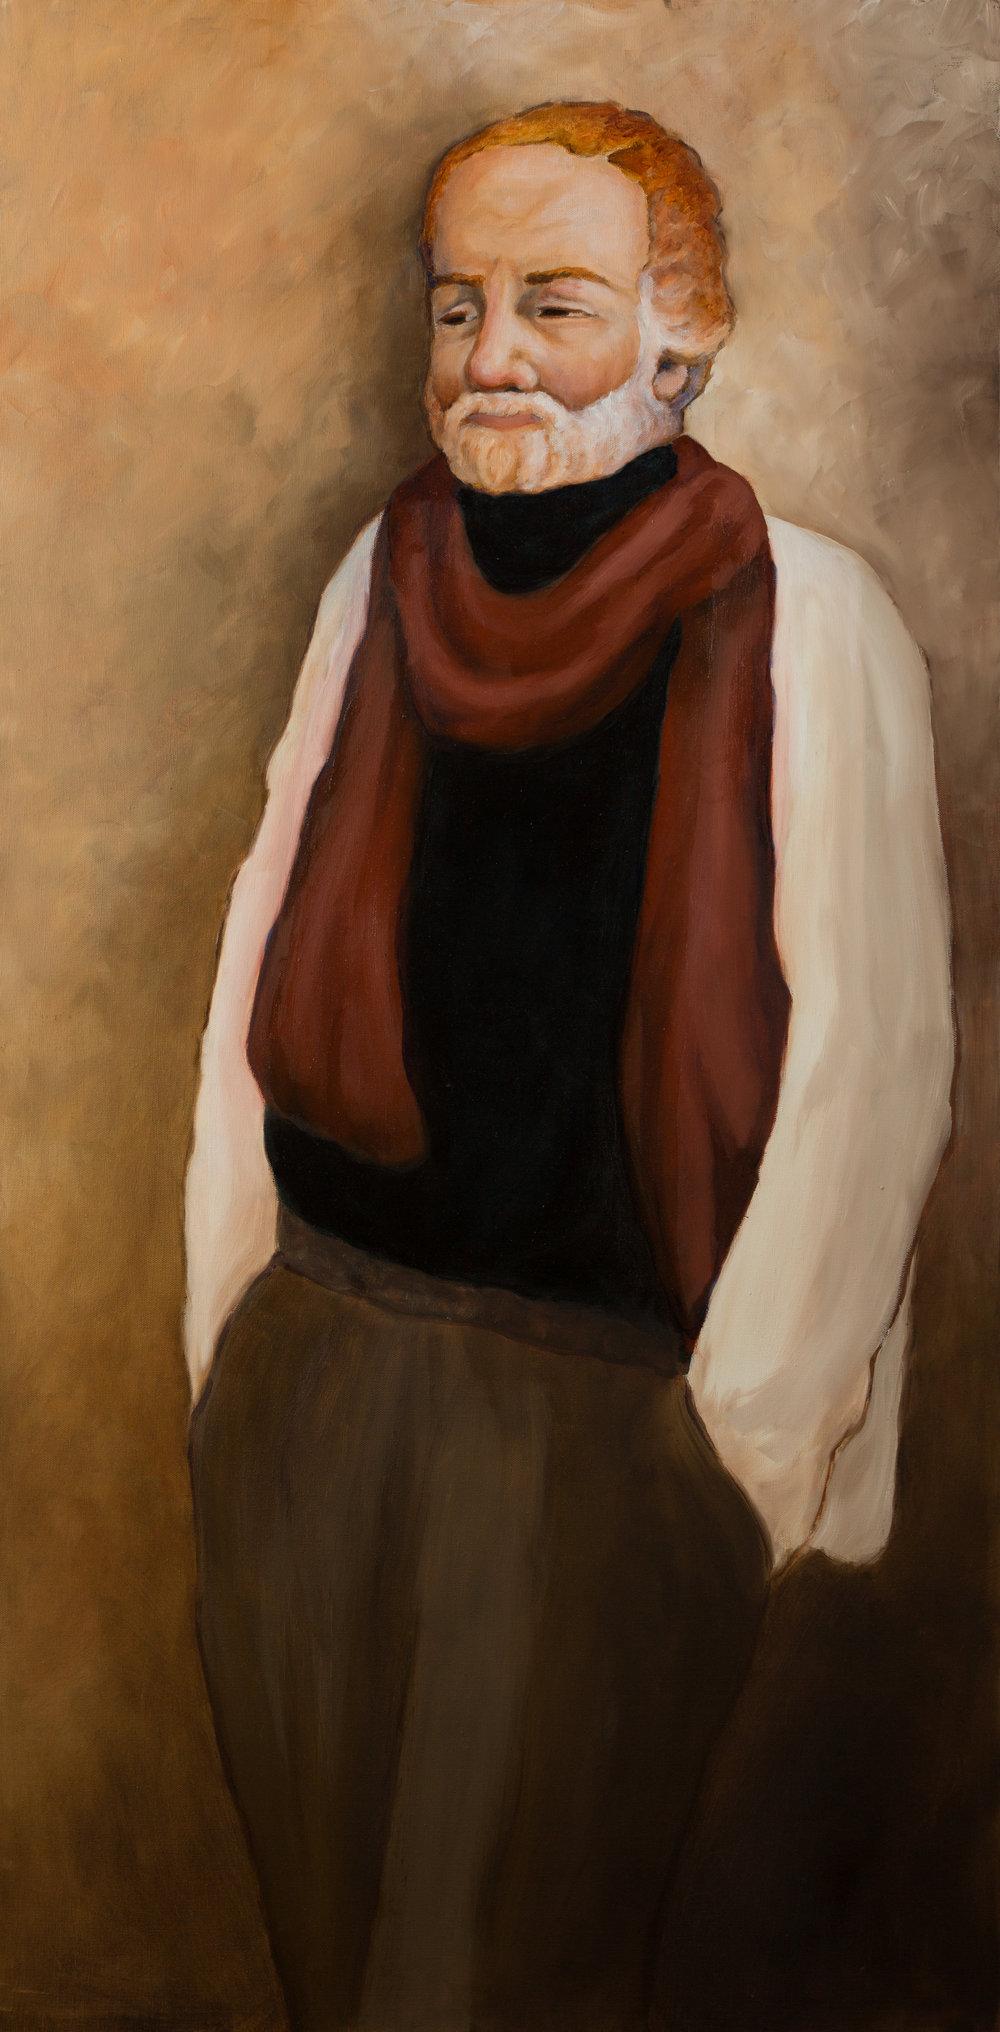 180704-Betsy-Nelson-Oil-Painting-0005.jpg